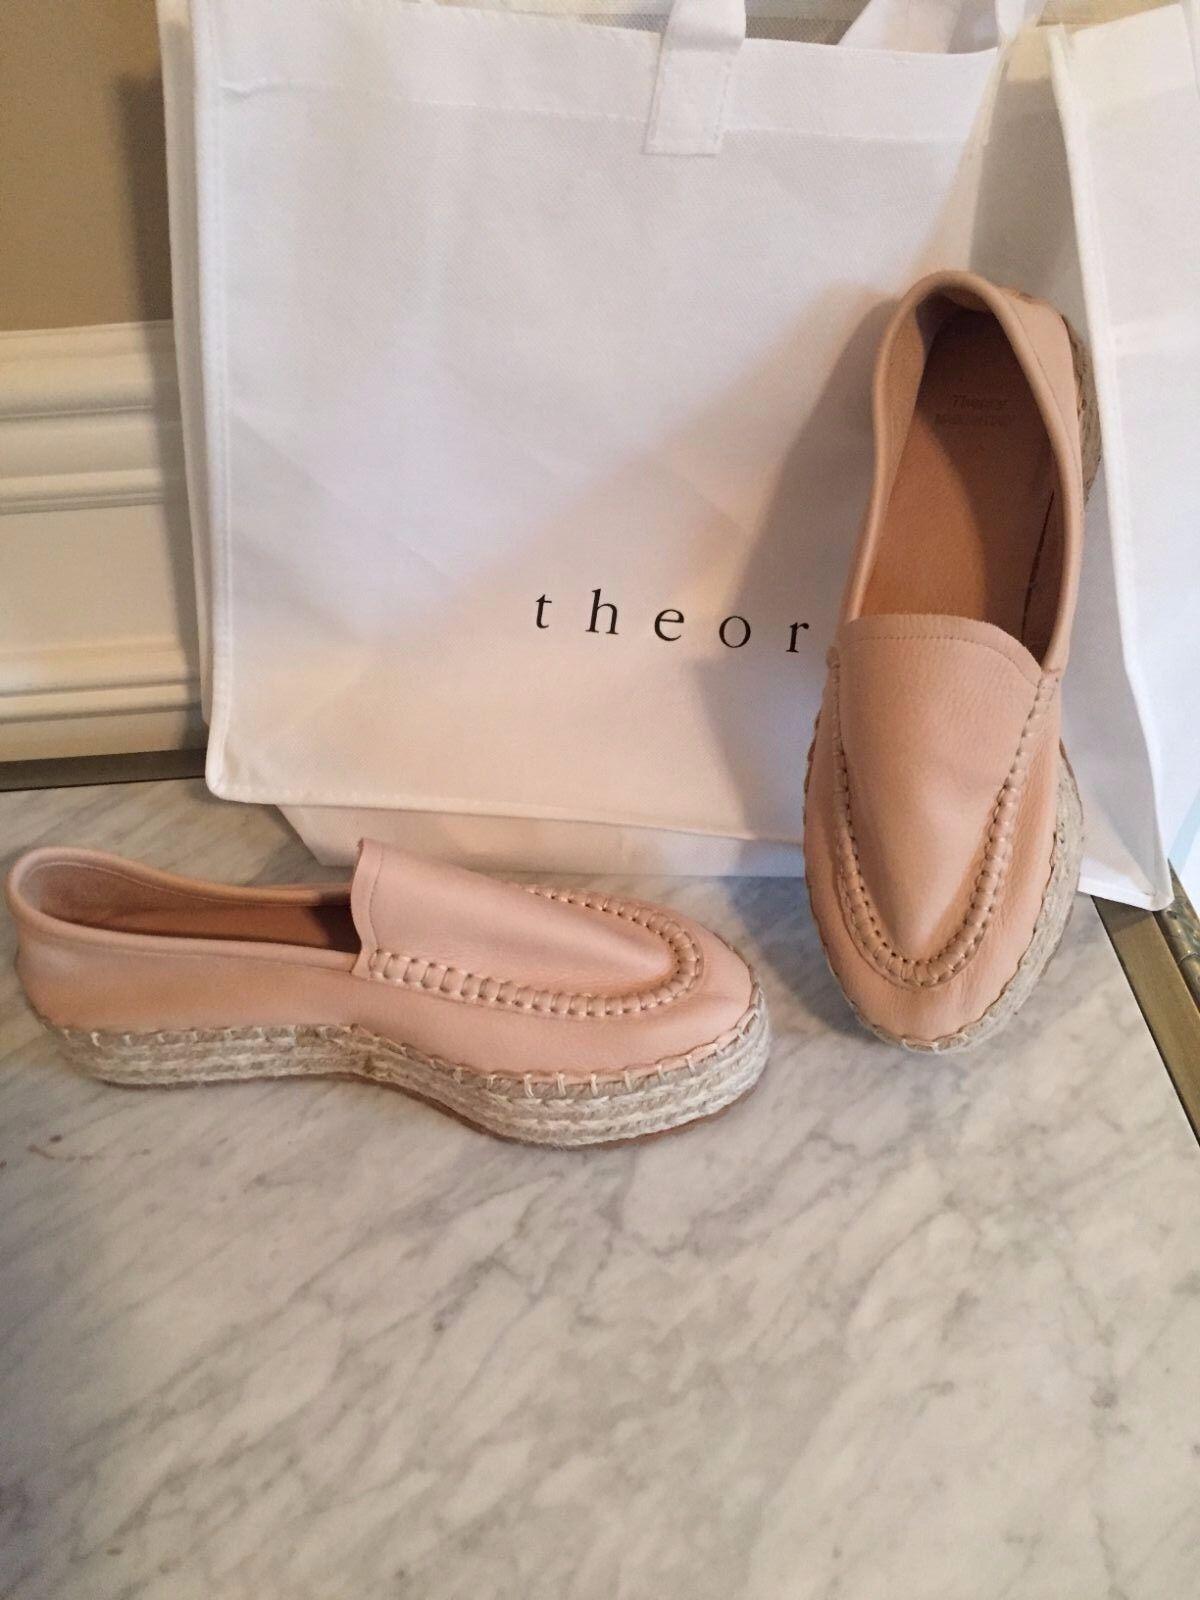 acquisti online Theory Theory Theory Leather Platform Espadrille scarpe  New 10  marchi di moda